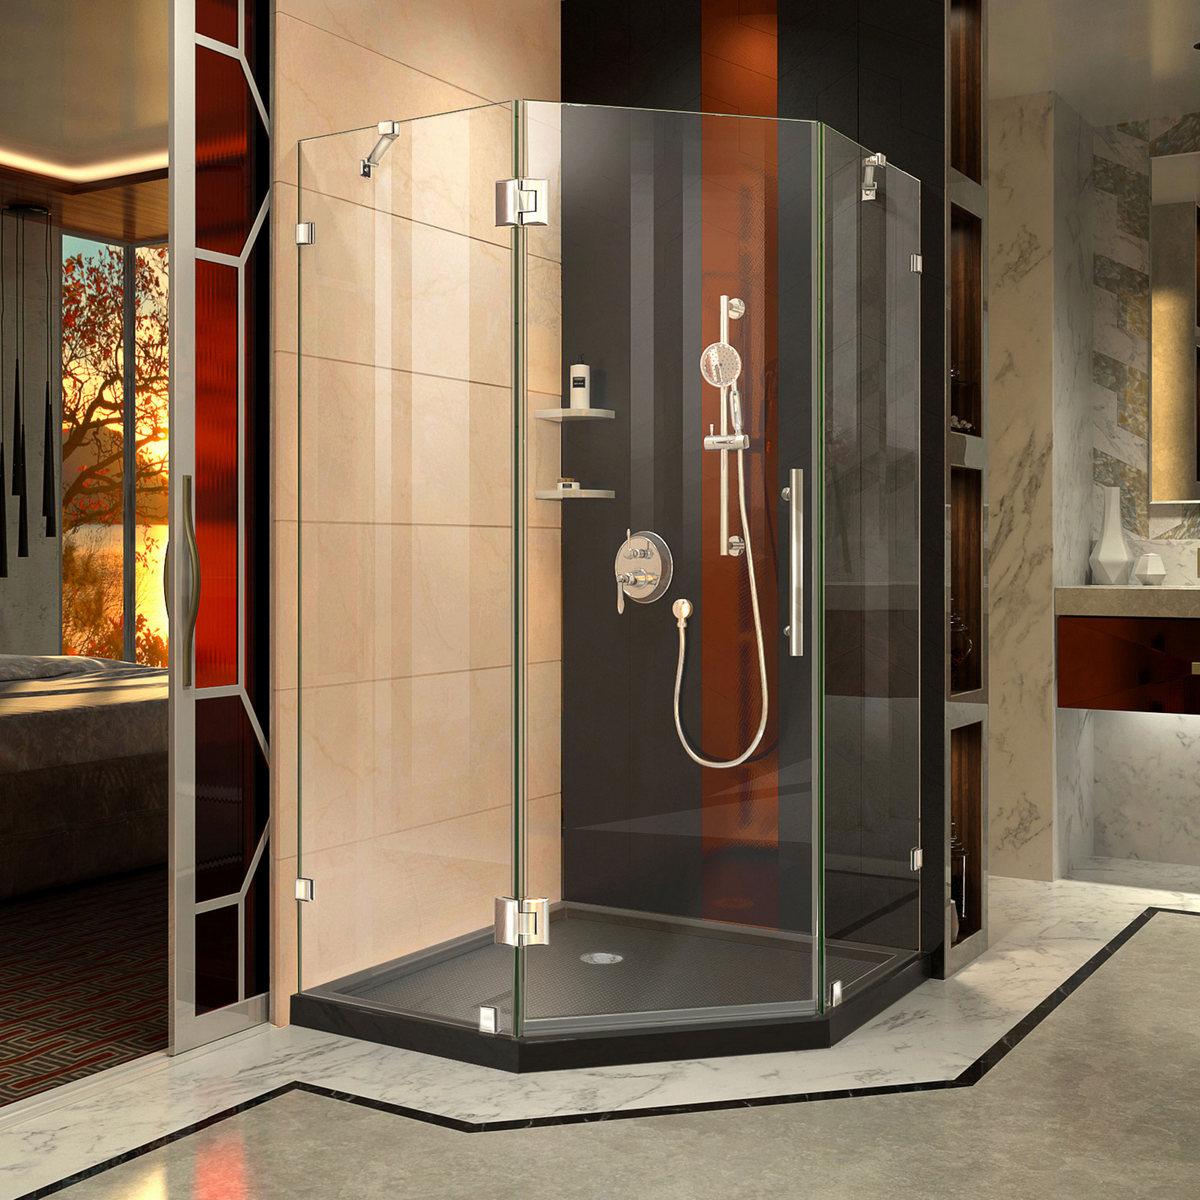 Dreamline Lux Hinged Shower Enclosure Chrome Corner Drain Black Base Kit